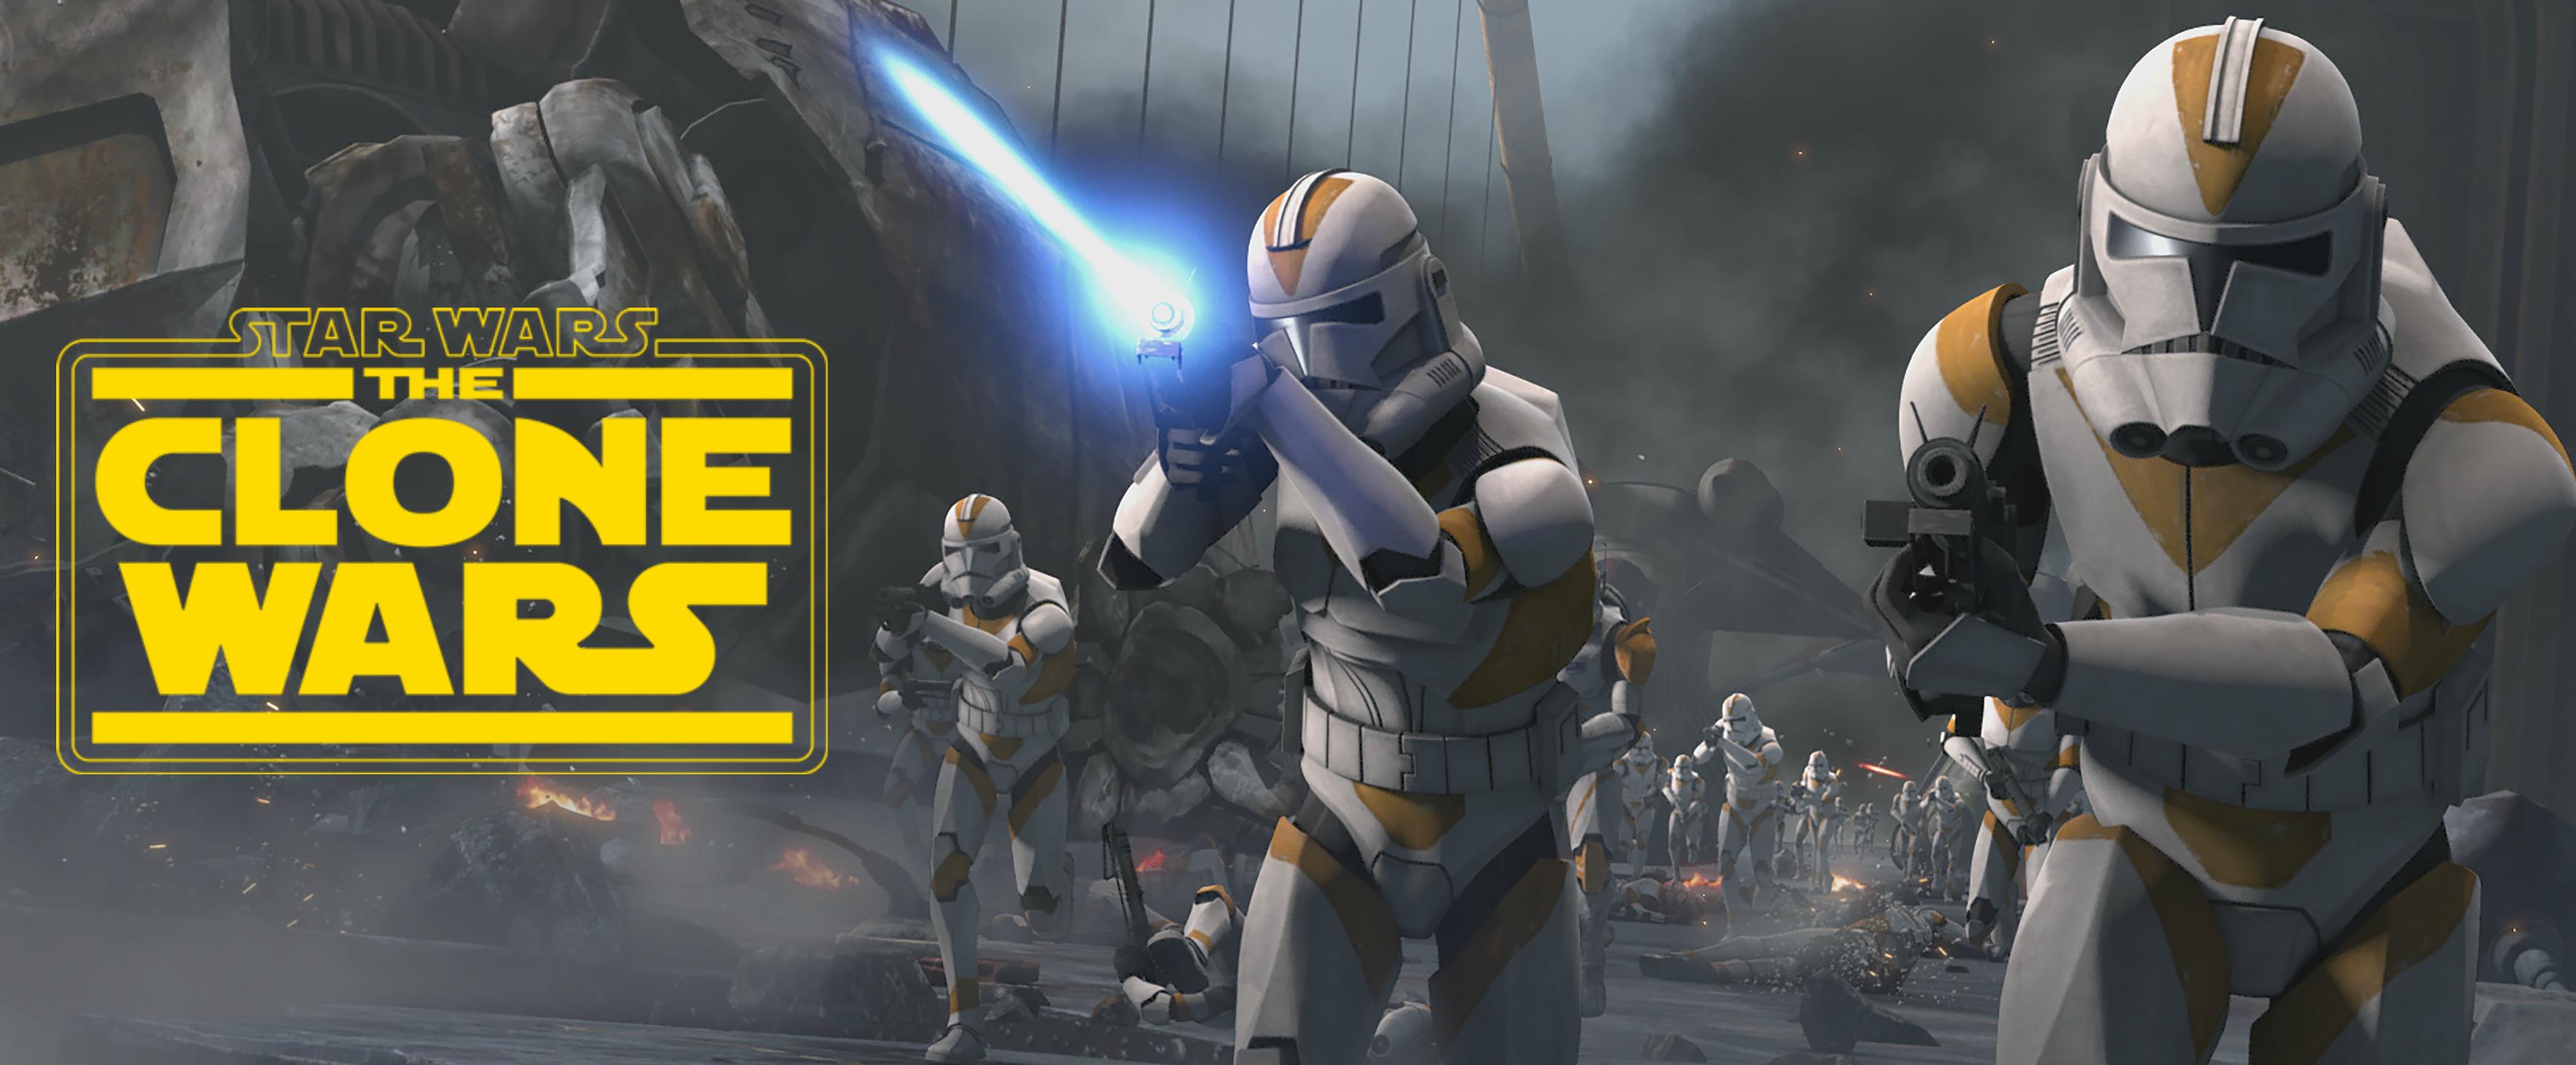 Topps Star Wars Digital Card Trader Stormtrooper Die-Cut Gingerbread Insert